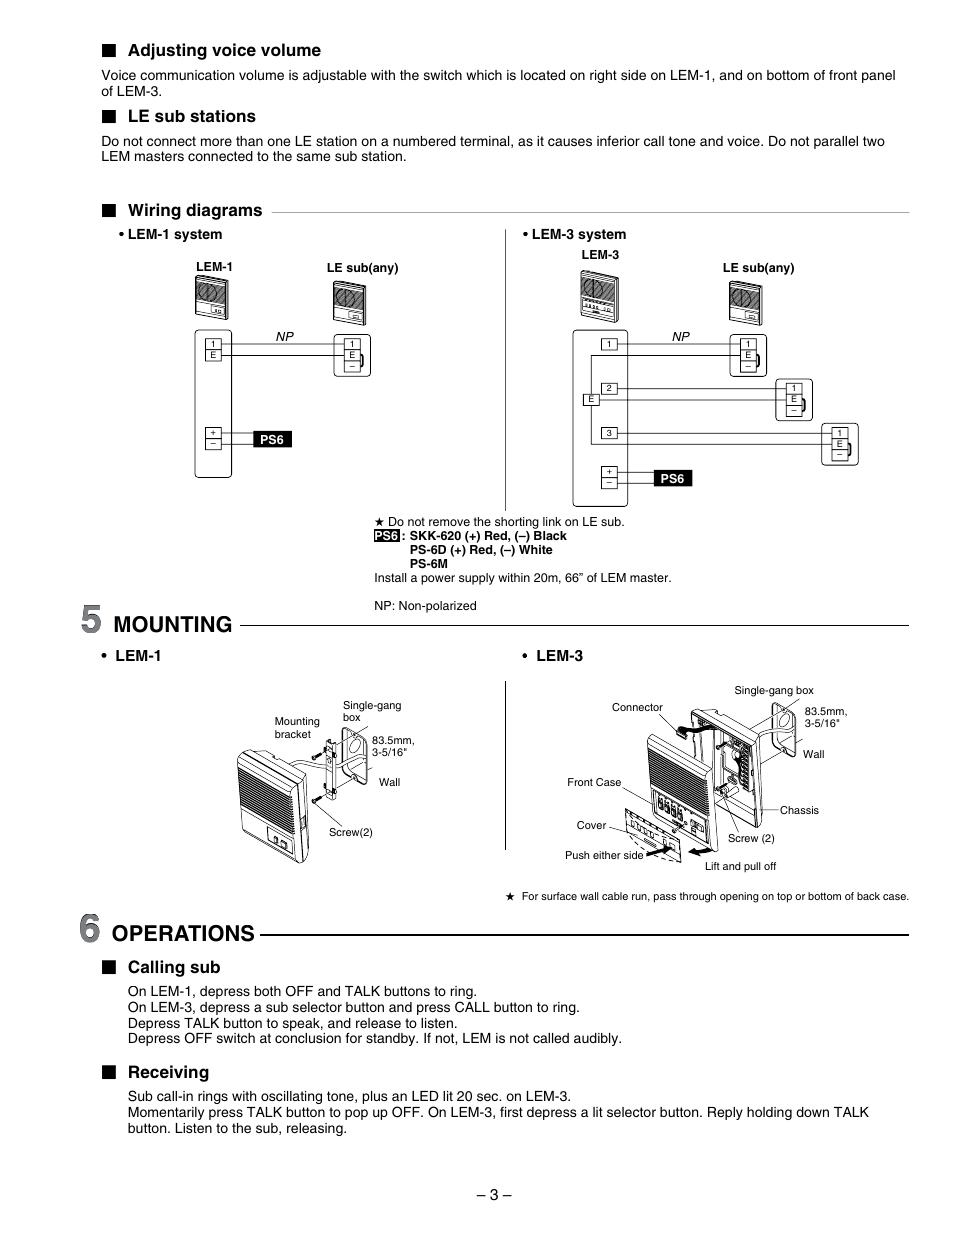 3 Gang Wiring Diagram Mounting Operations Adjusting Voice Volume Aiphone Lem